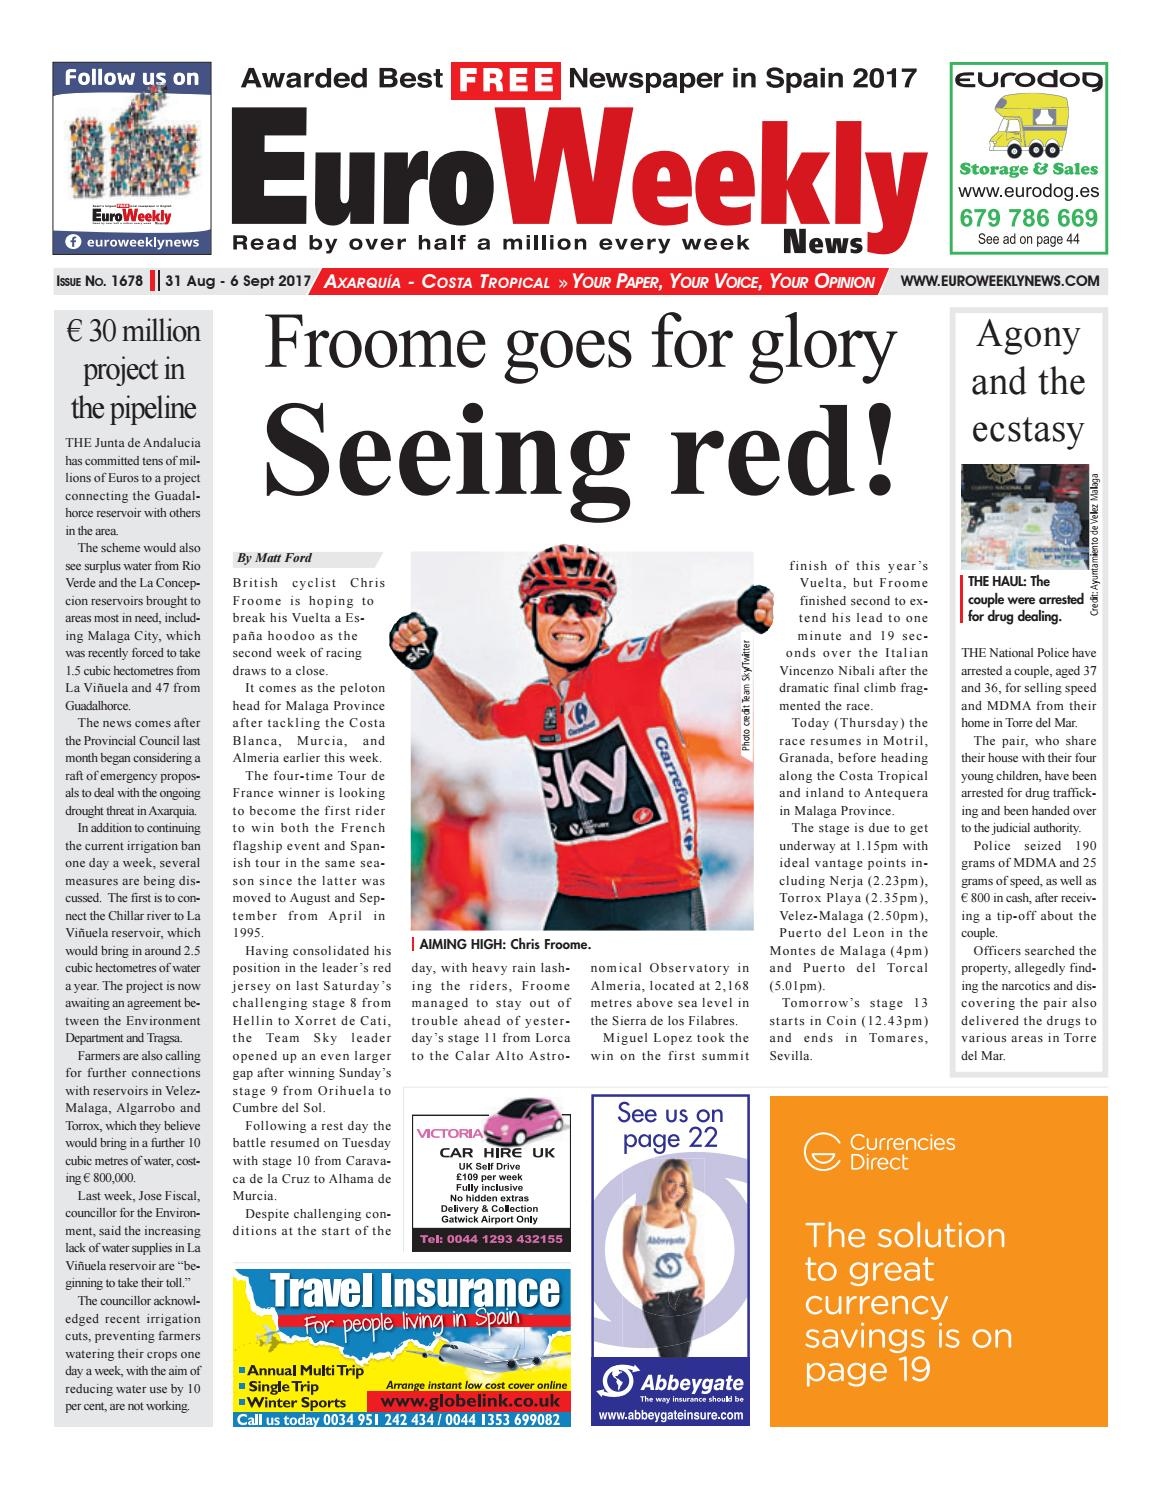 Actor Porno En Tenerife 2017 euro weekly news - axarquia 31 august – 6 september 2017